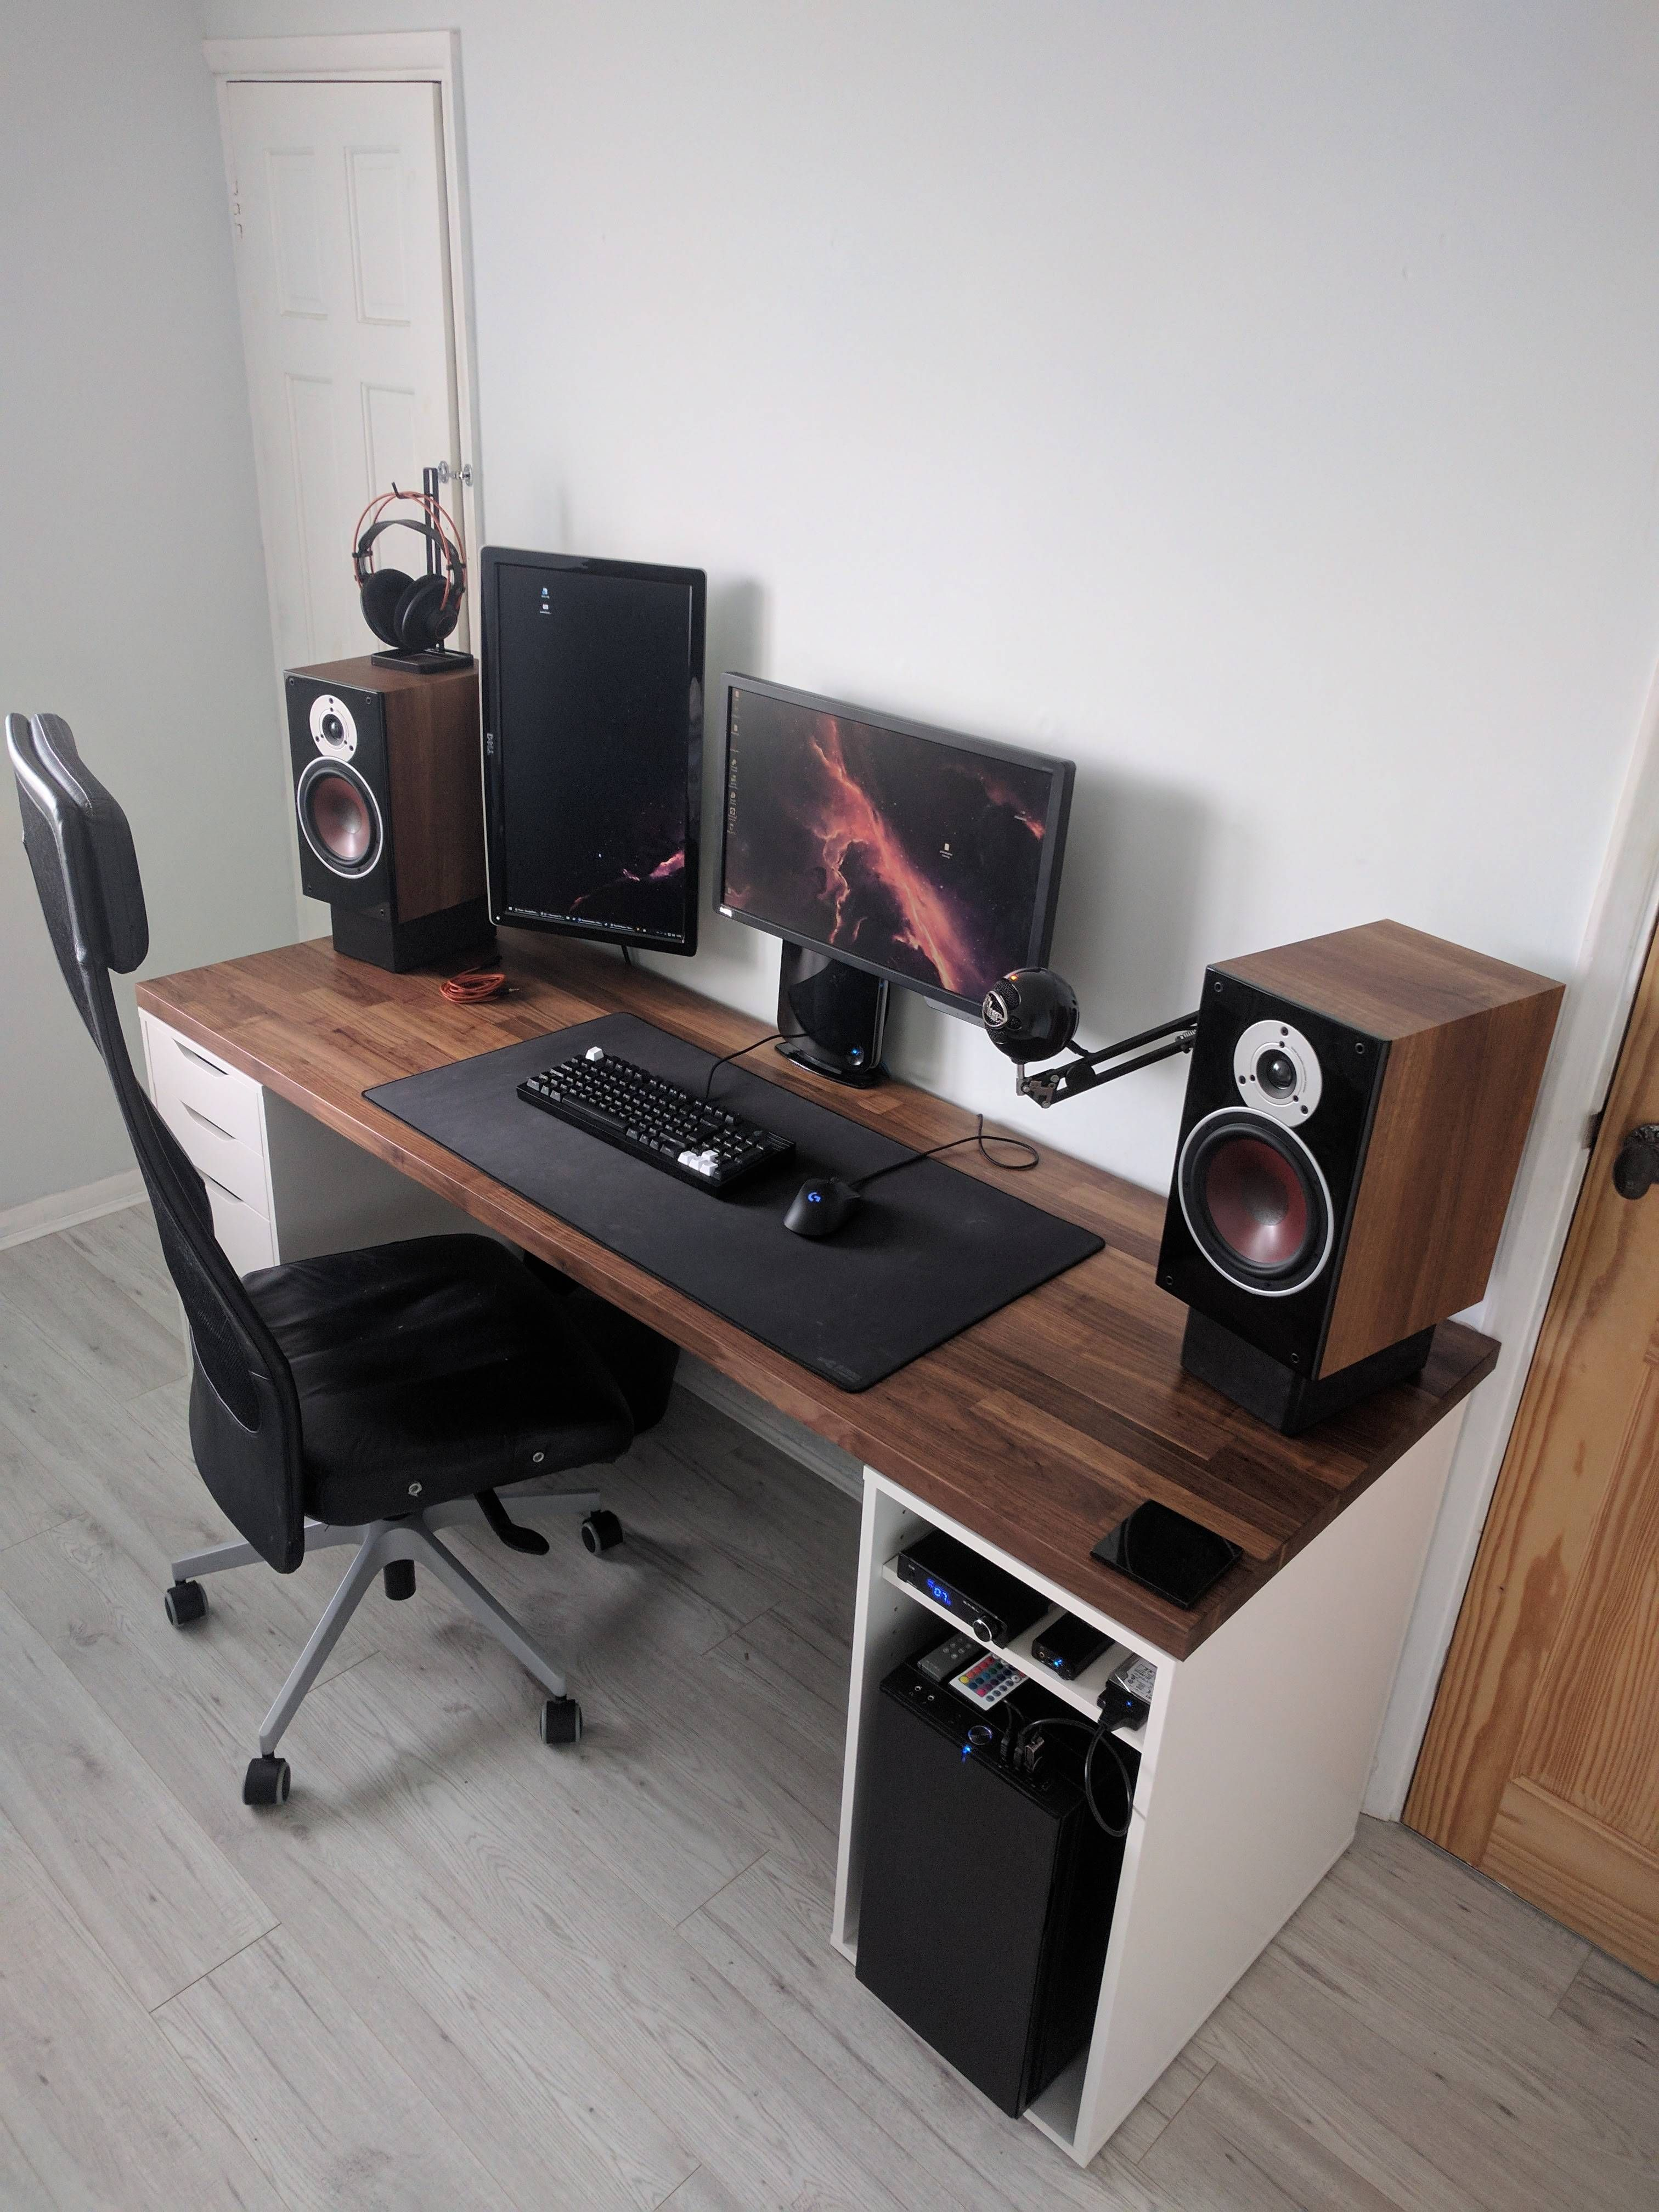 Nice Office Chair Reddit And Steel Got A New Desk Bestgamesetups Pinterest Desks